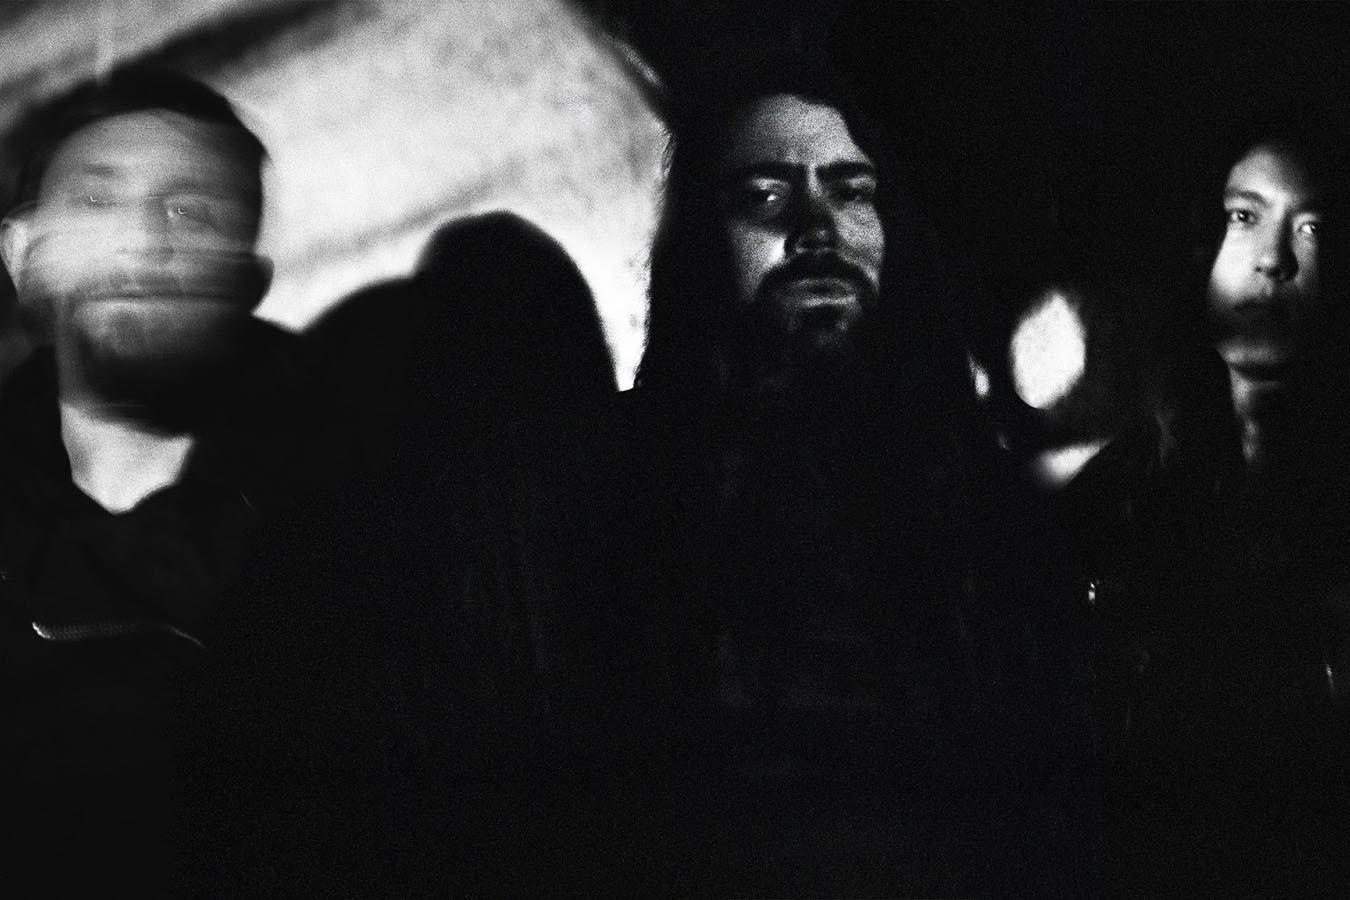 HEALTH announce new album 'VOL. 4 :: SLAVES OF FEAR'